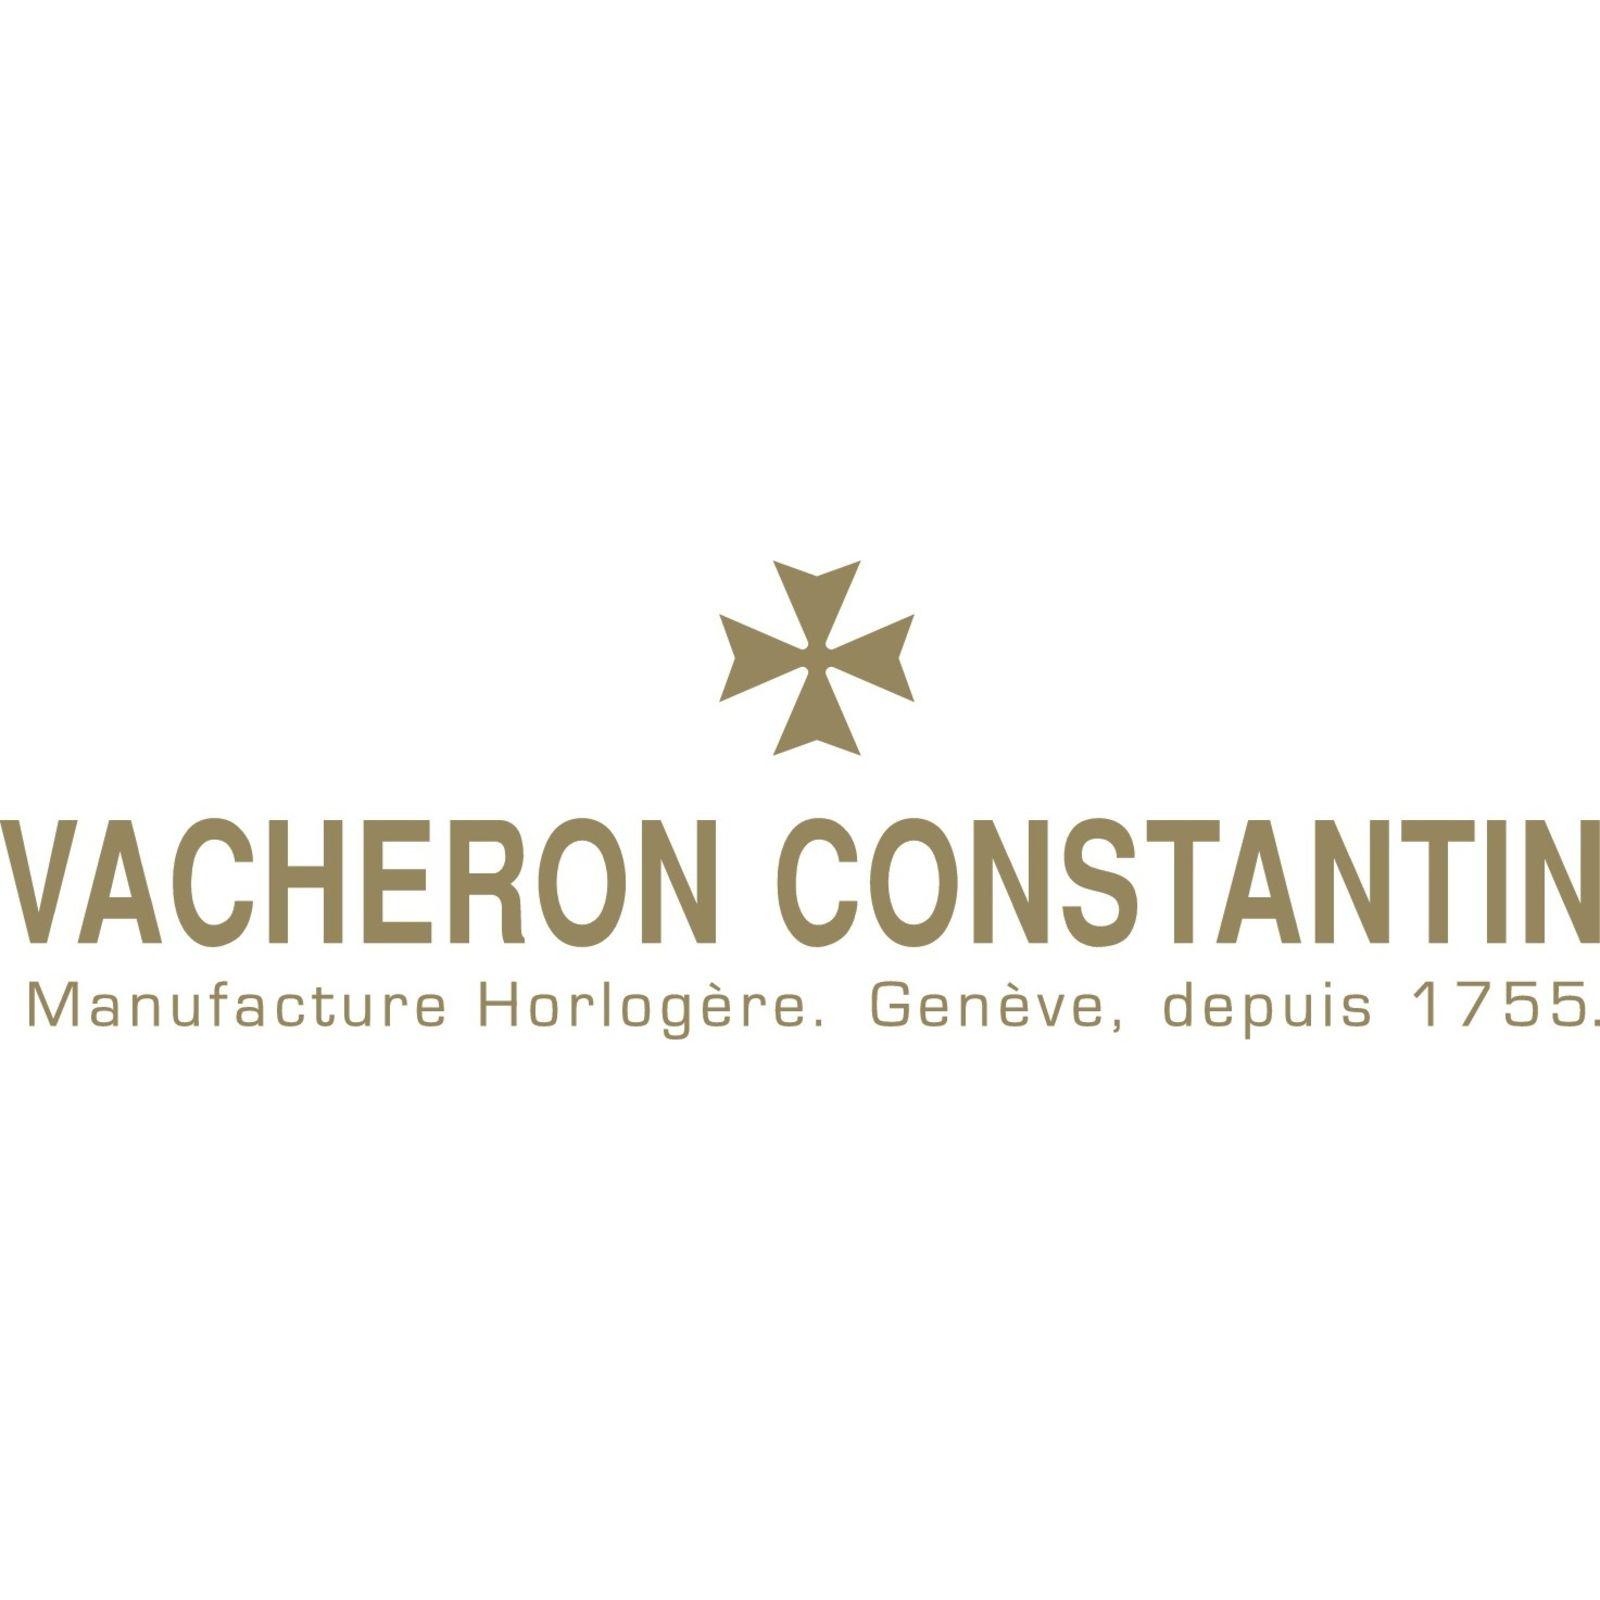 Vacheron Constantin (Bild 1)